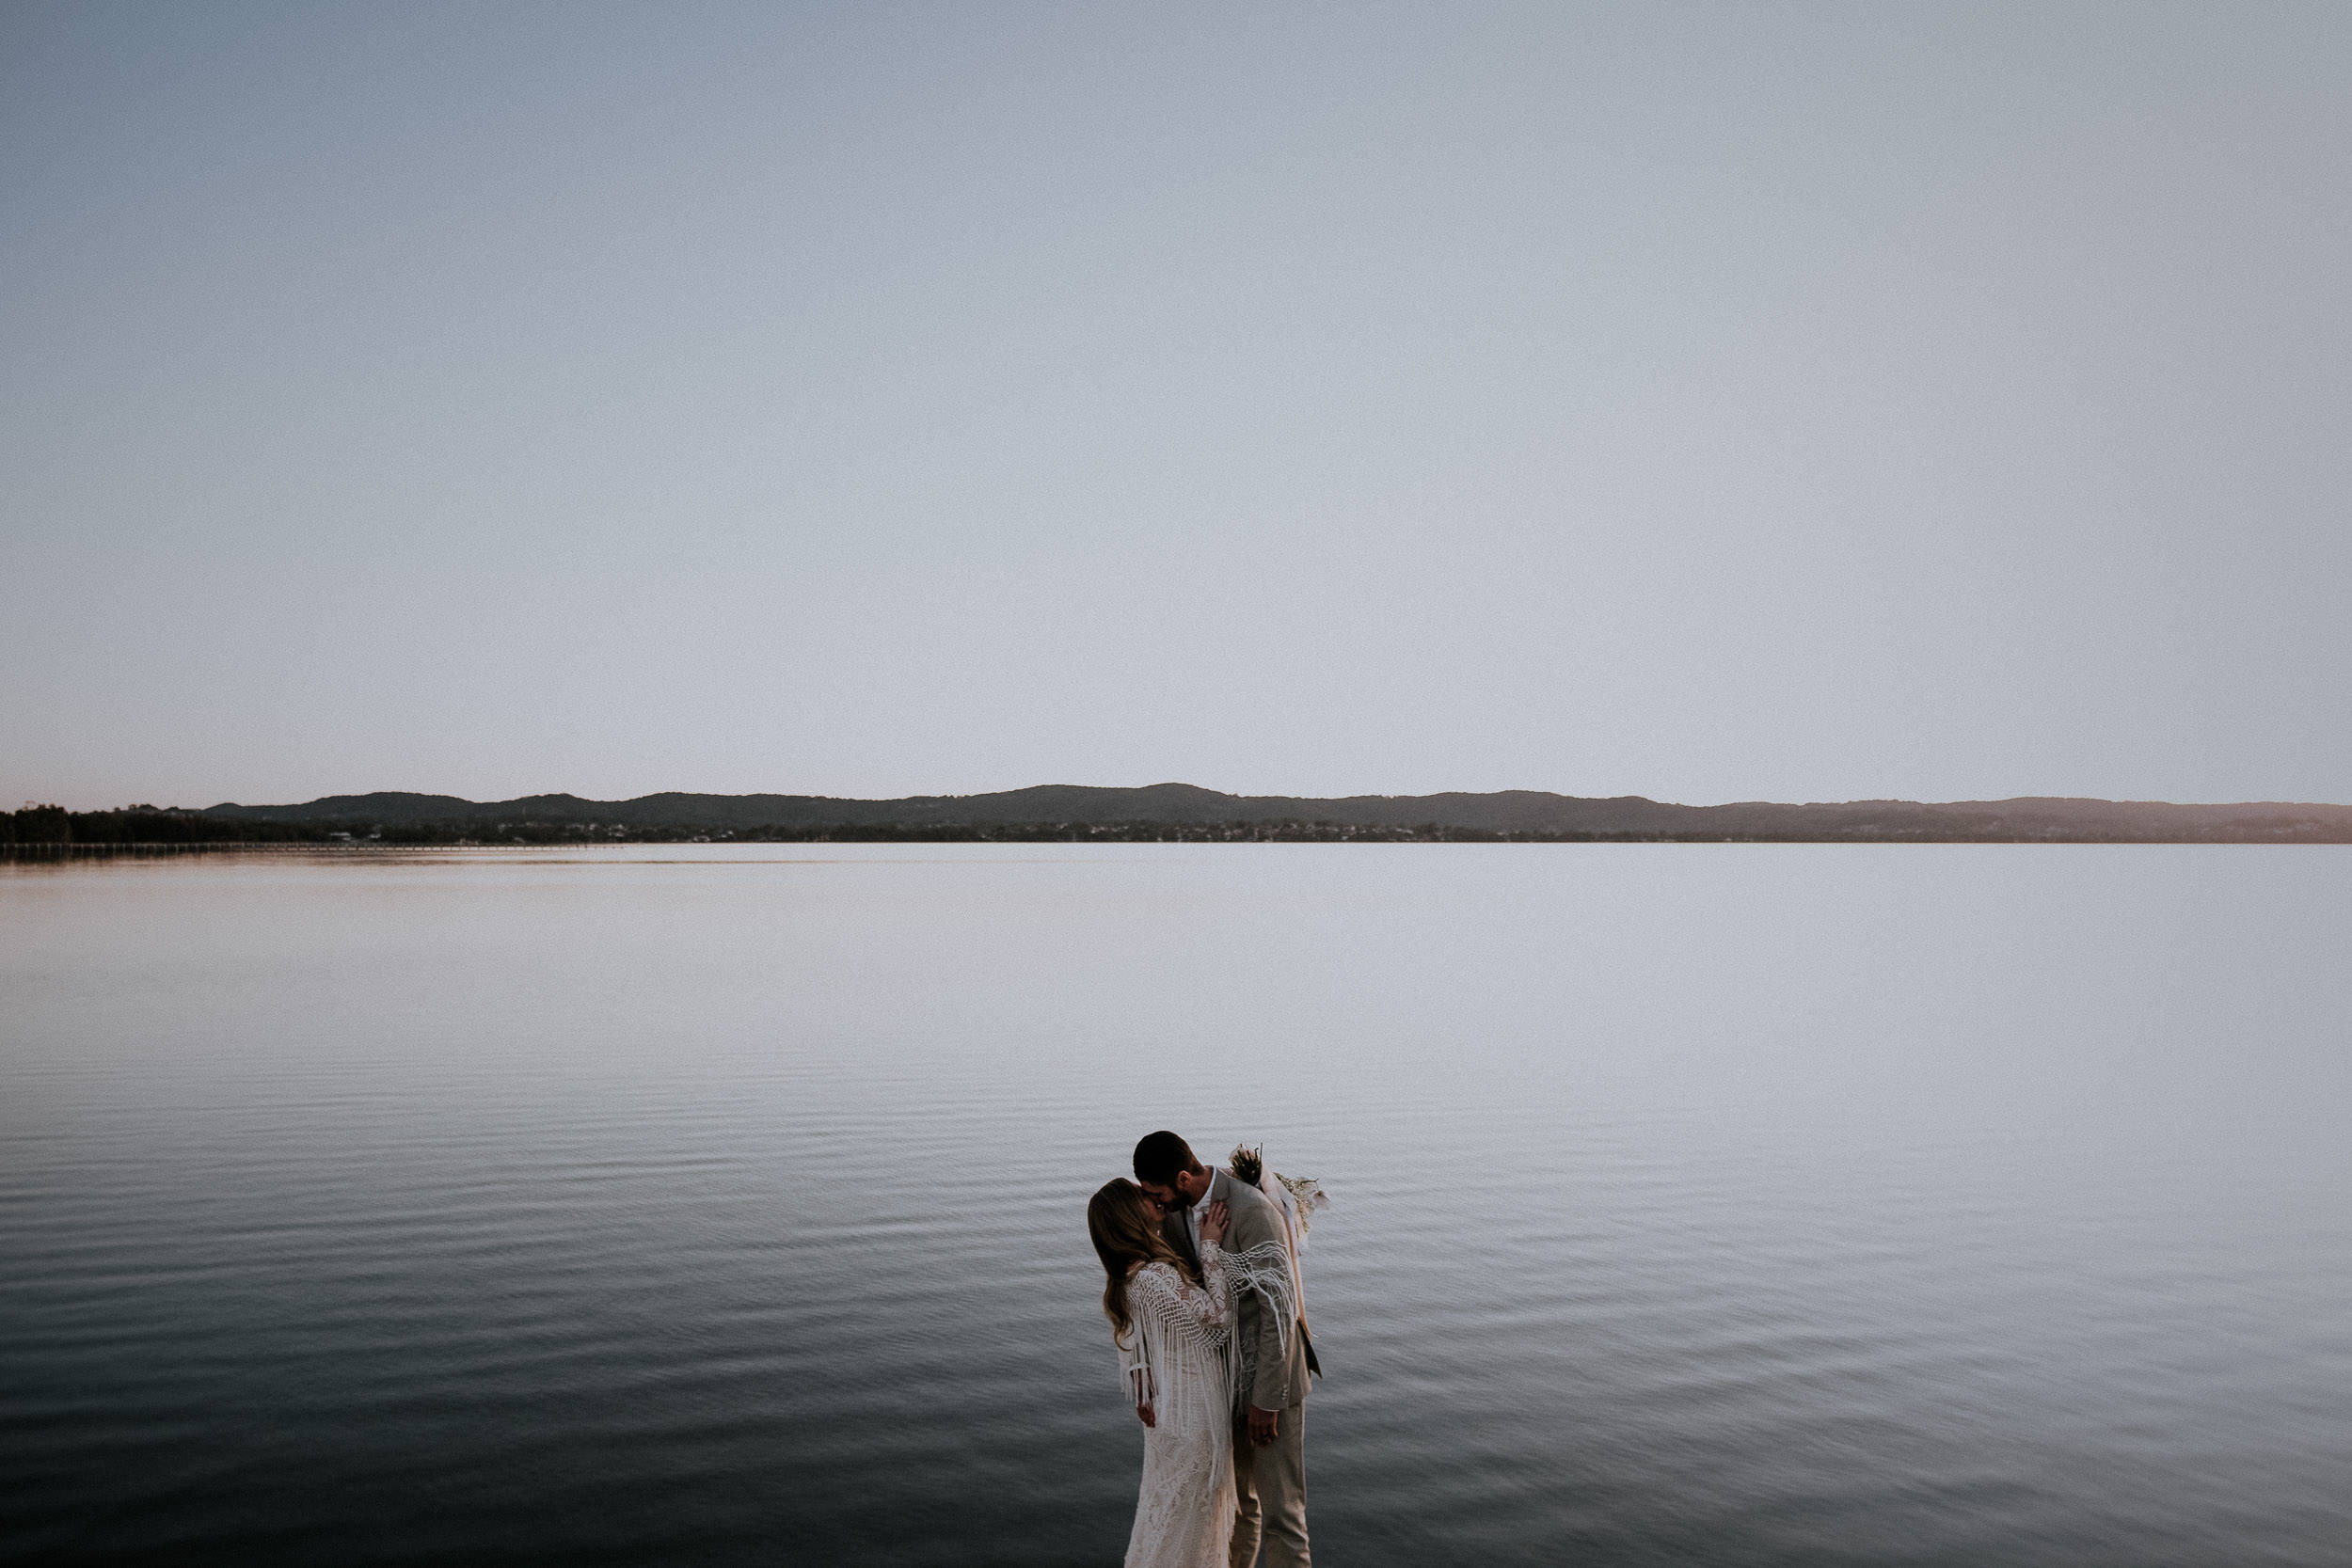 S&A Elopement - Kings & Thieves - Shred 'Til Dead - Central Coast Beach Forest Wedding - 396.jpg